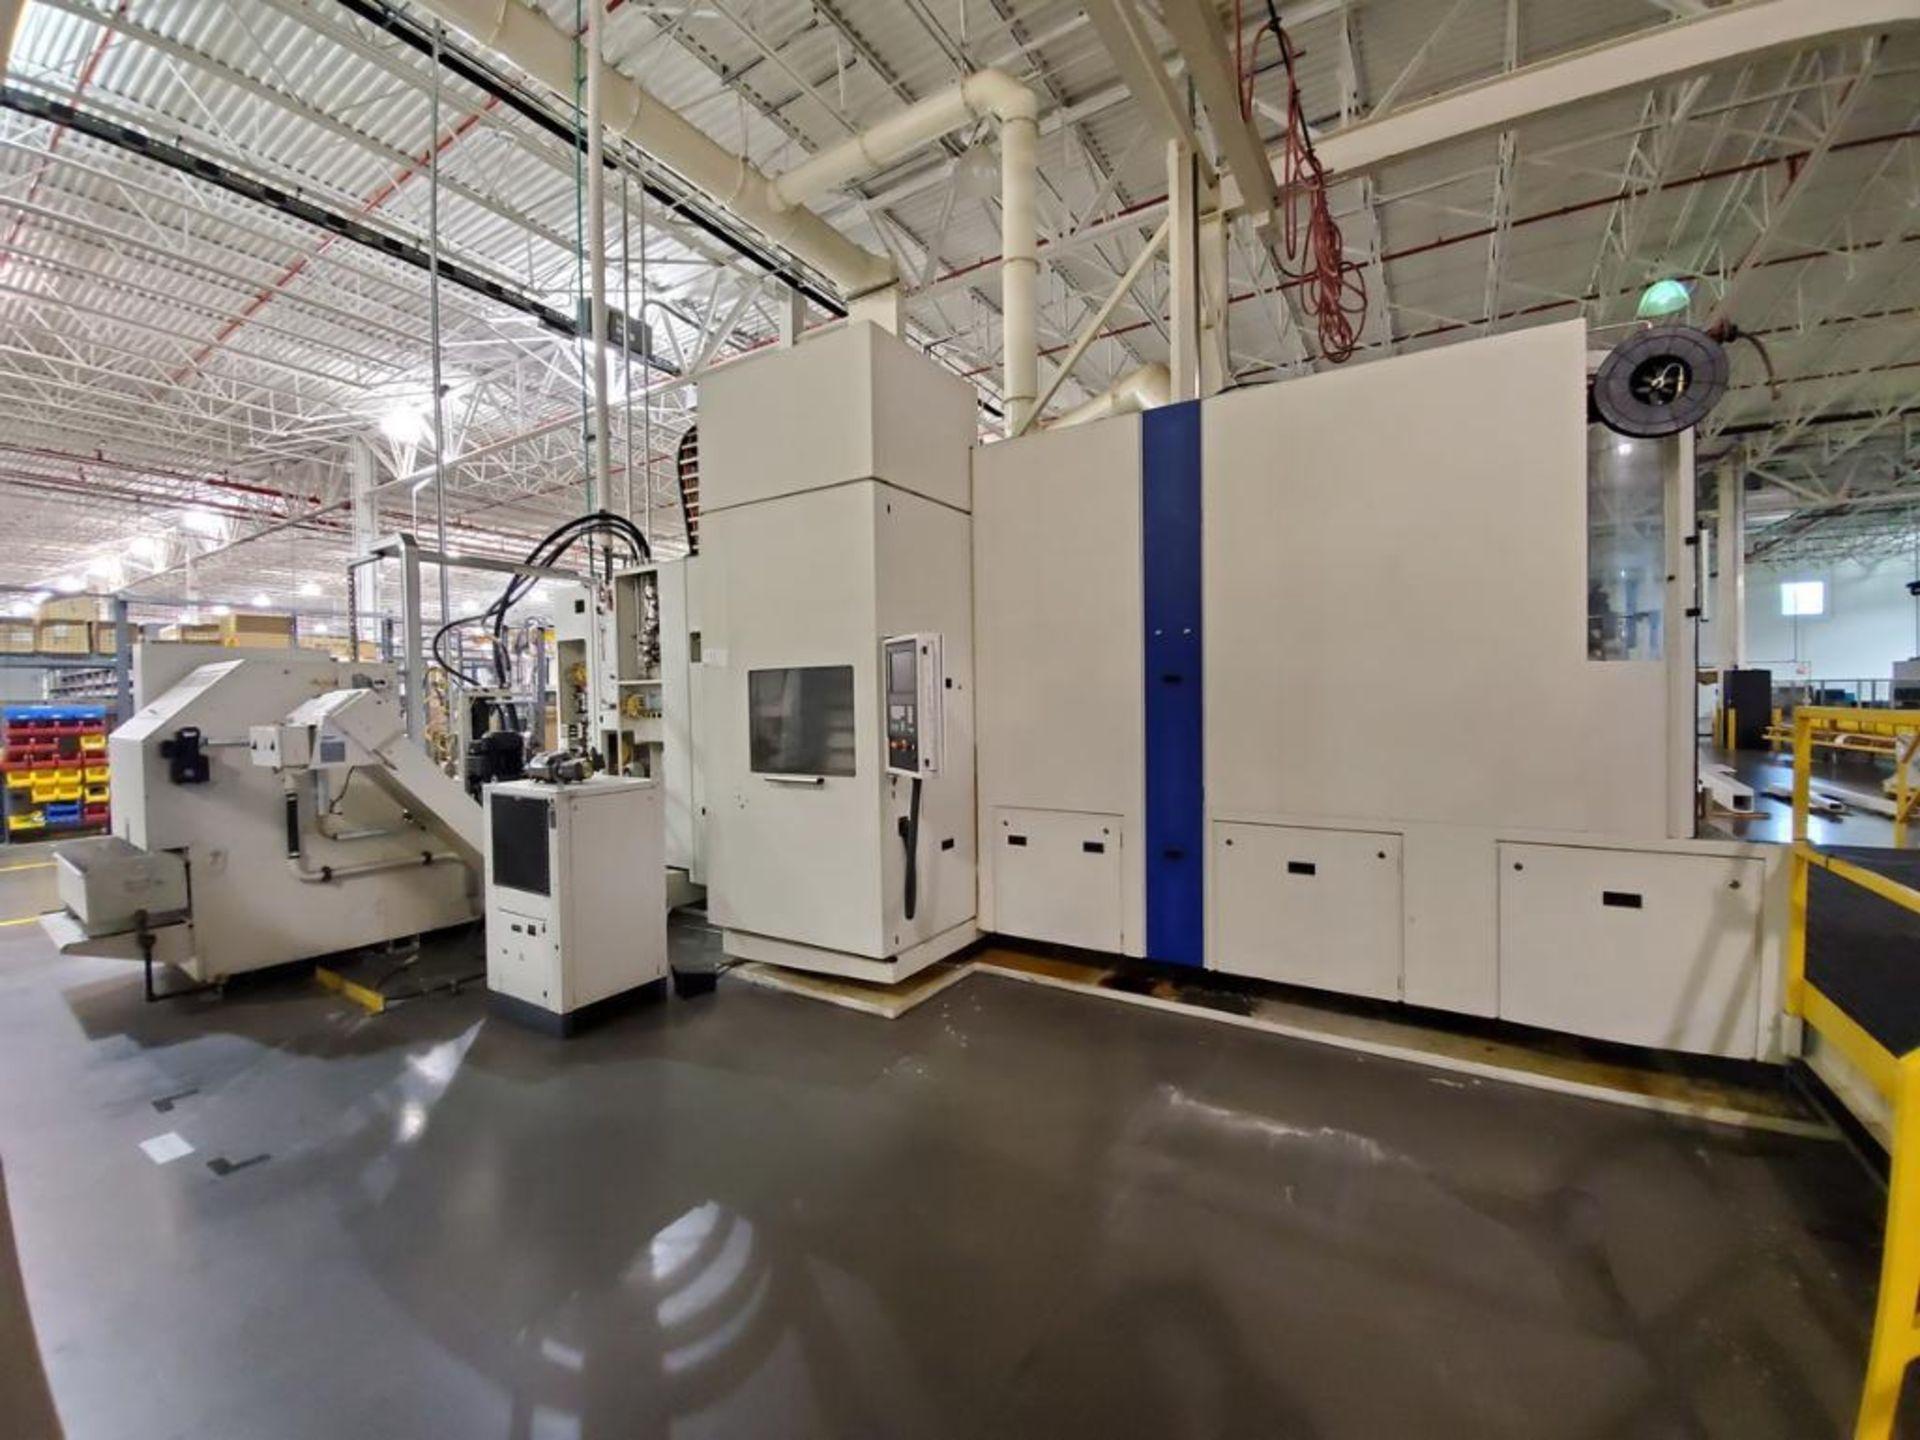 Lot 2 - 2011 Heller MCH 400 PC, Horizontal Machining Center